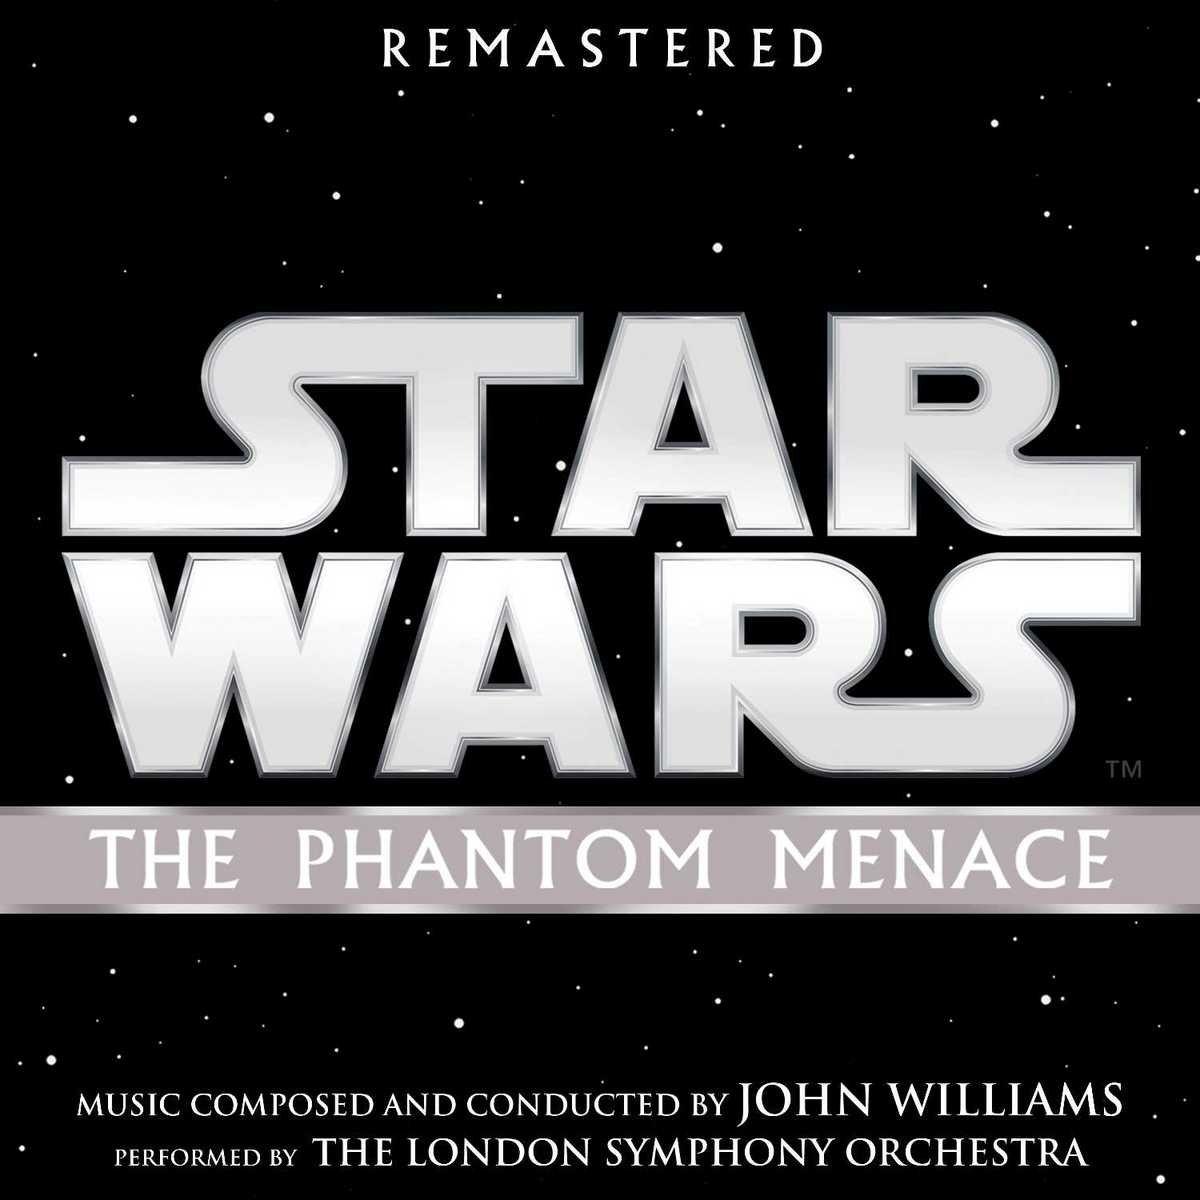 Star Wars: The Phantom Menace Remastered